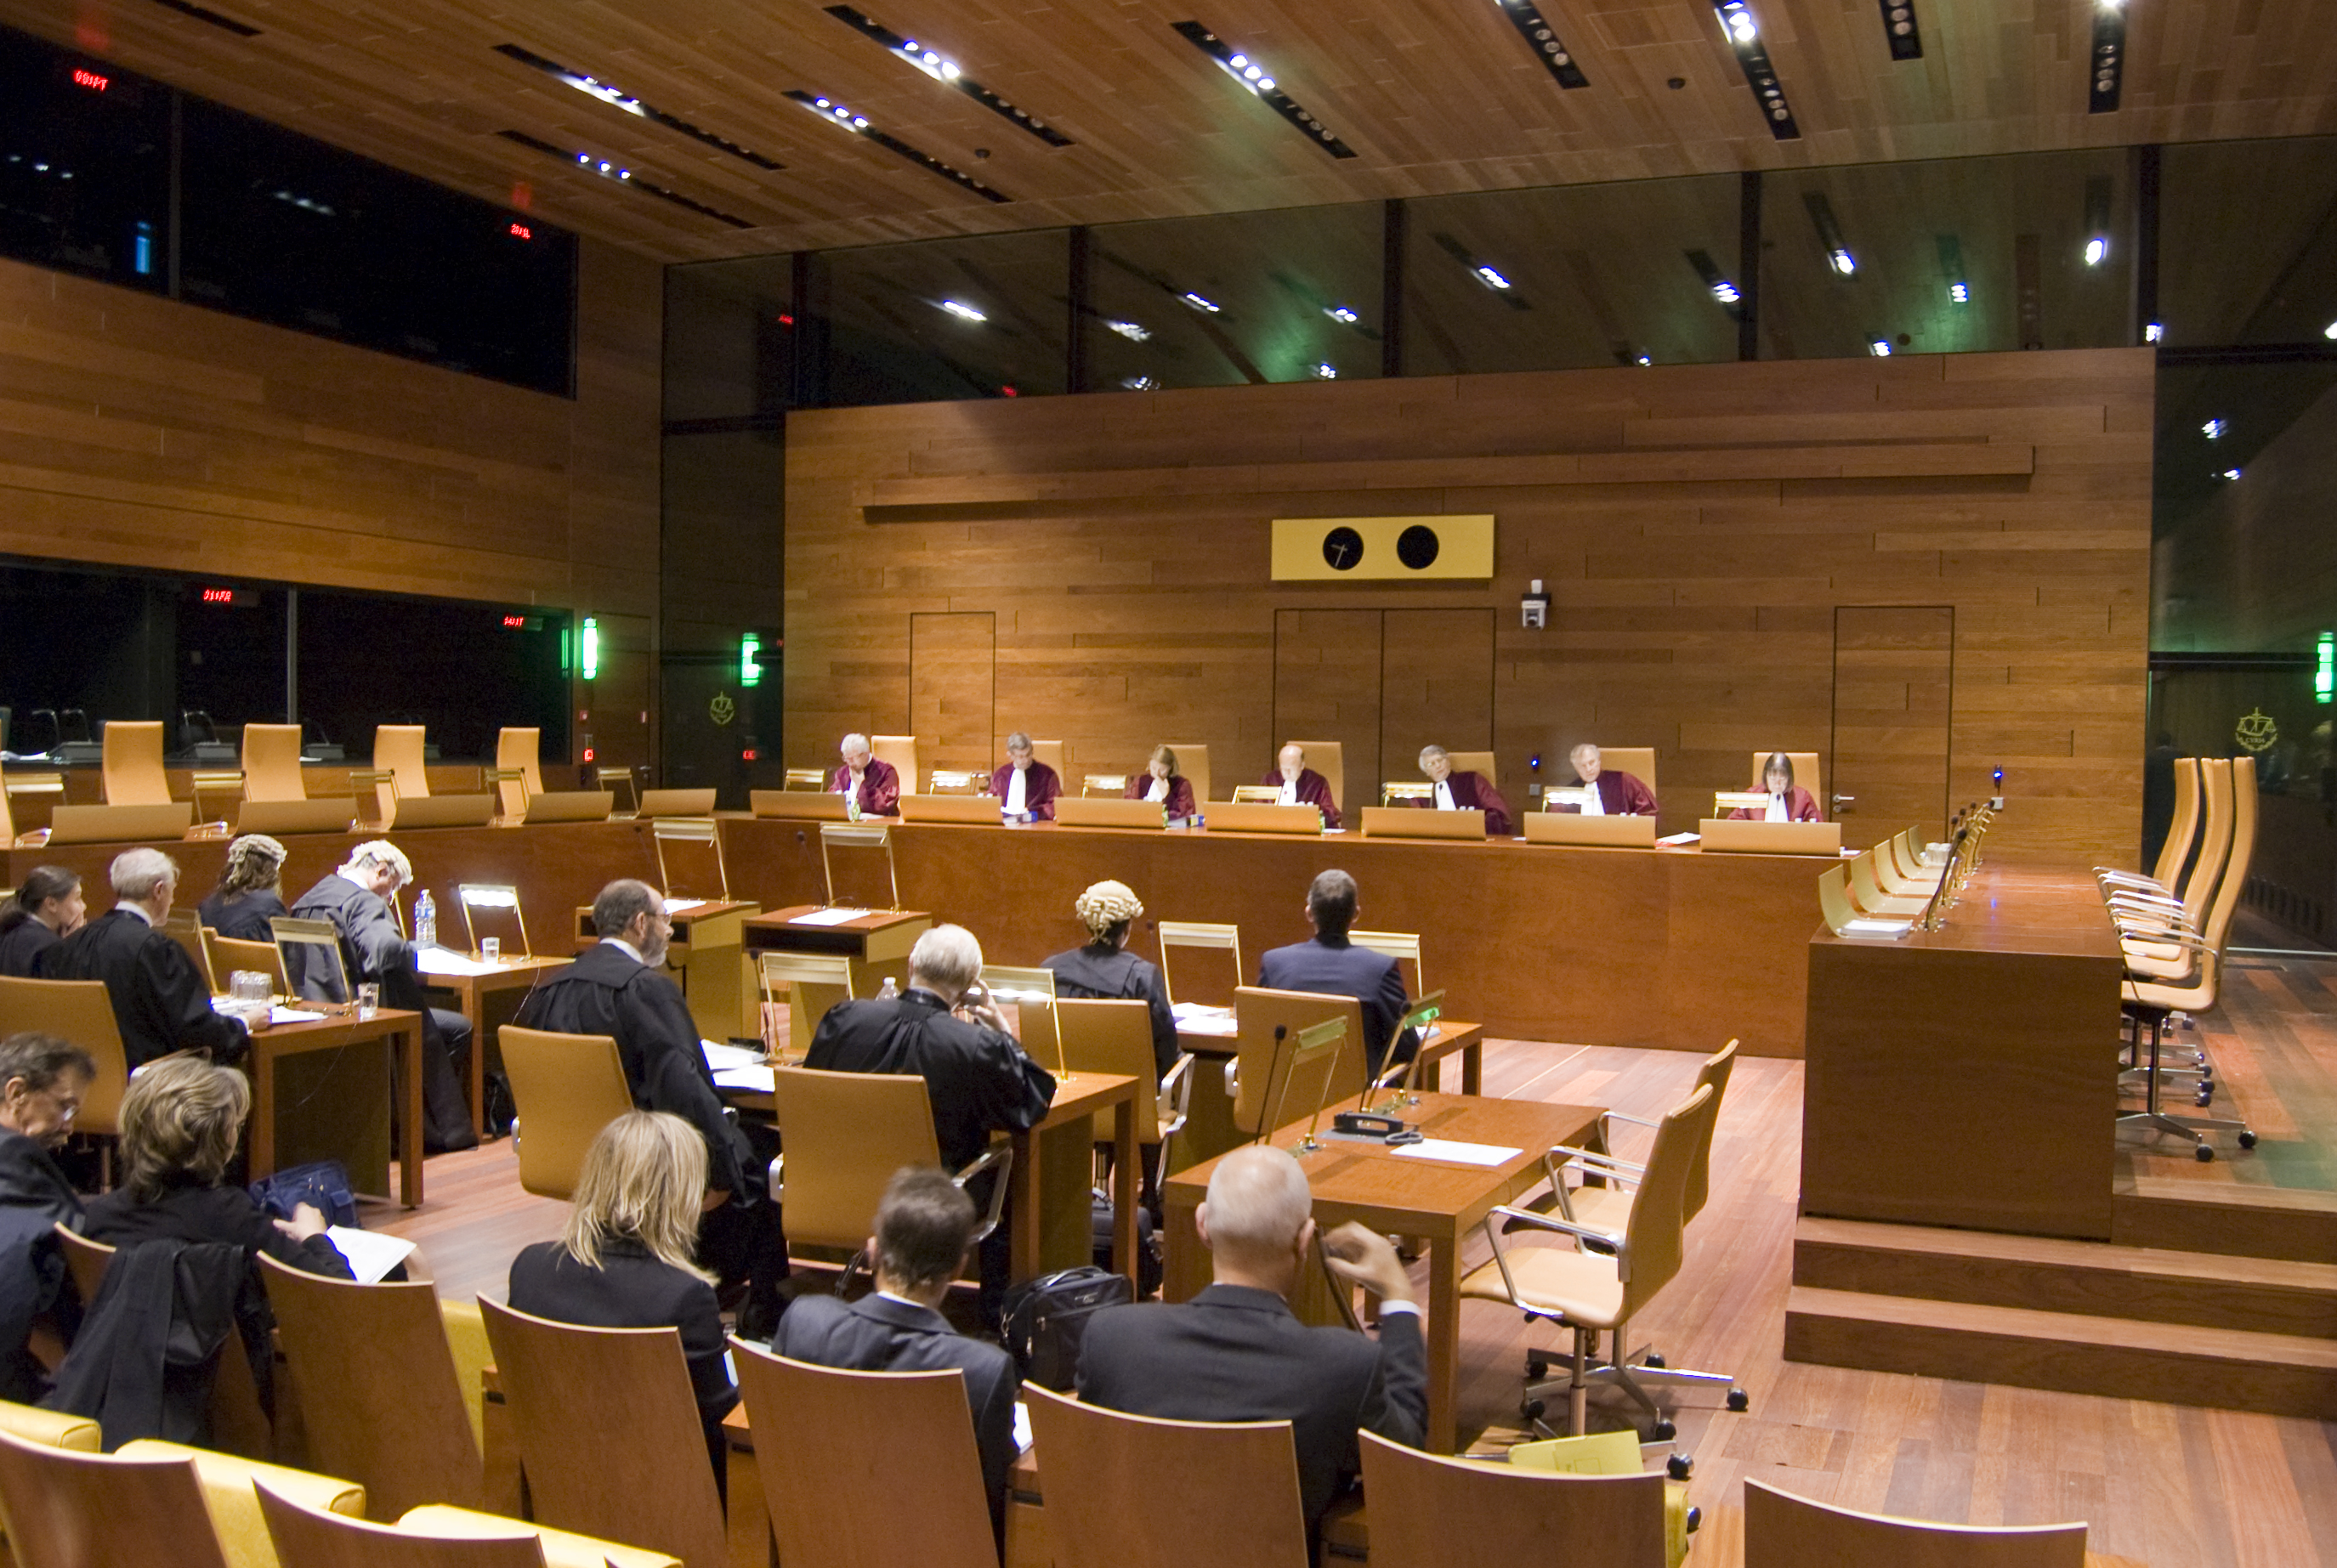 Sitzung des EU-Gerichts